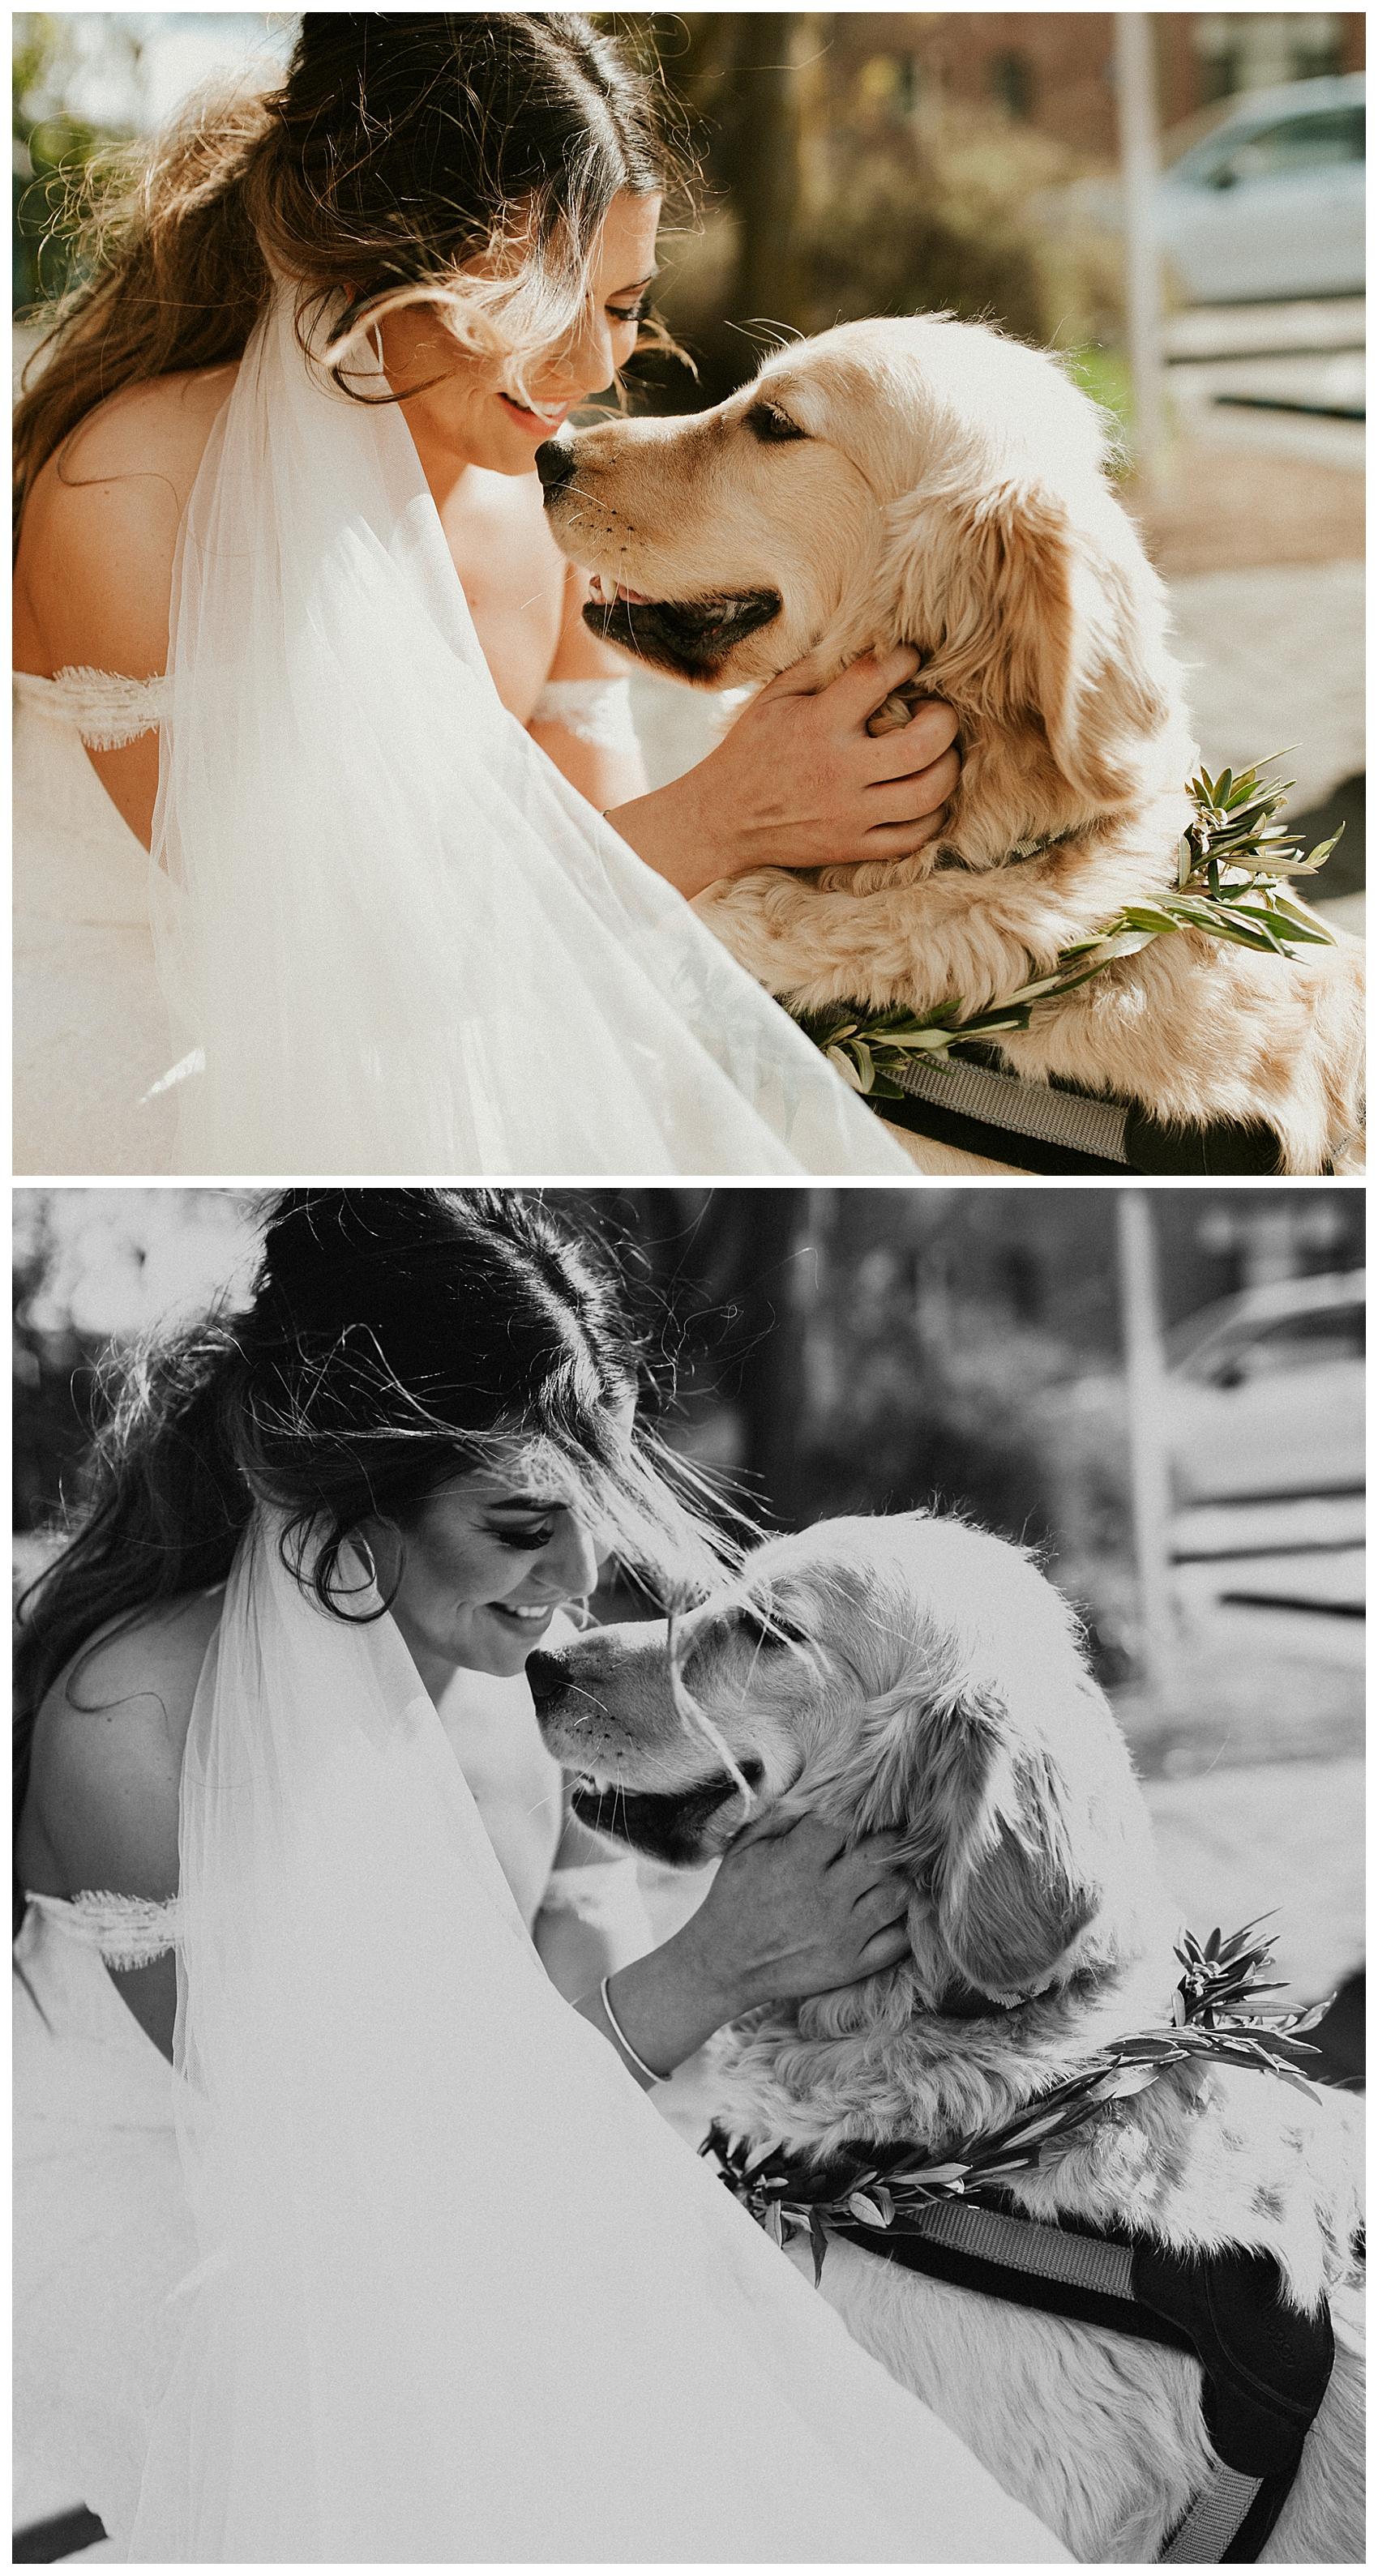 Chateau Rive Spokane Wedding Cassie Trottier Photography01040.jpg